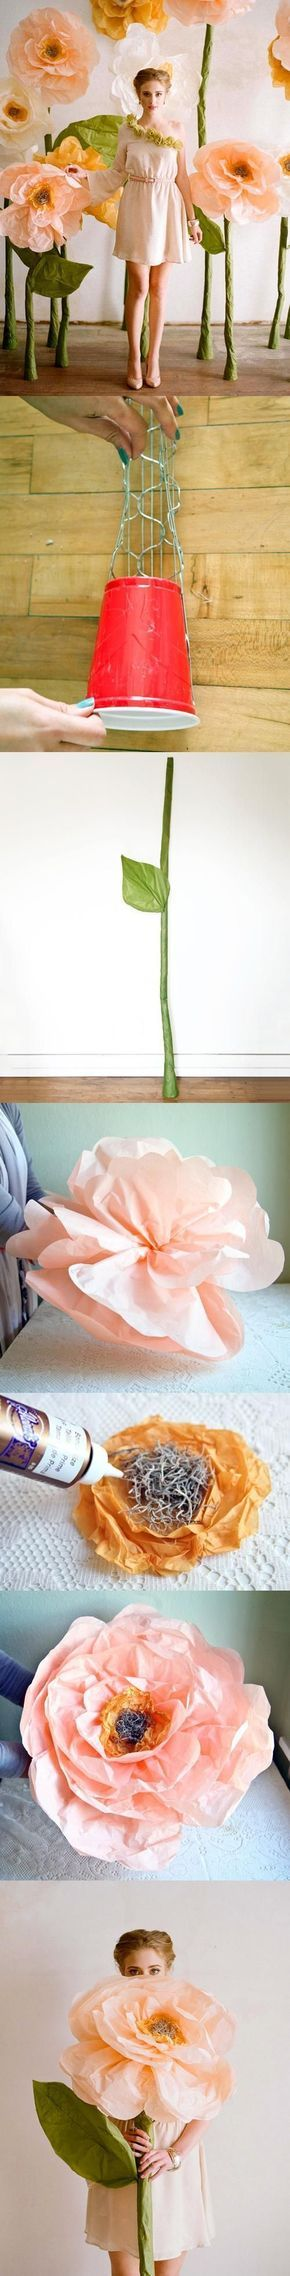 Giant tissue flower tutorial some steps mariage pinterest giant tissue flower tutorial some steps mightylinksfo